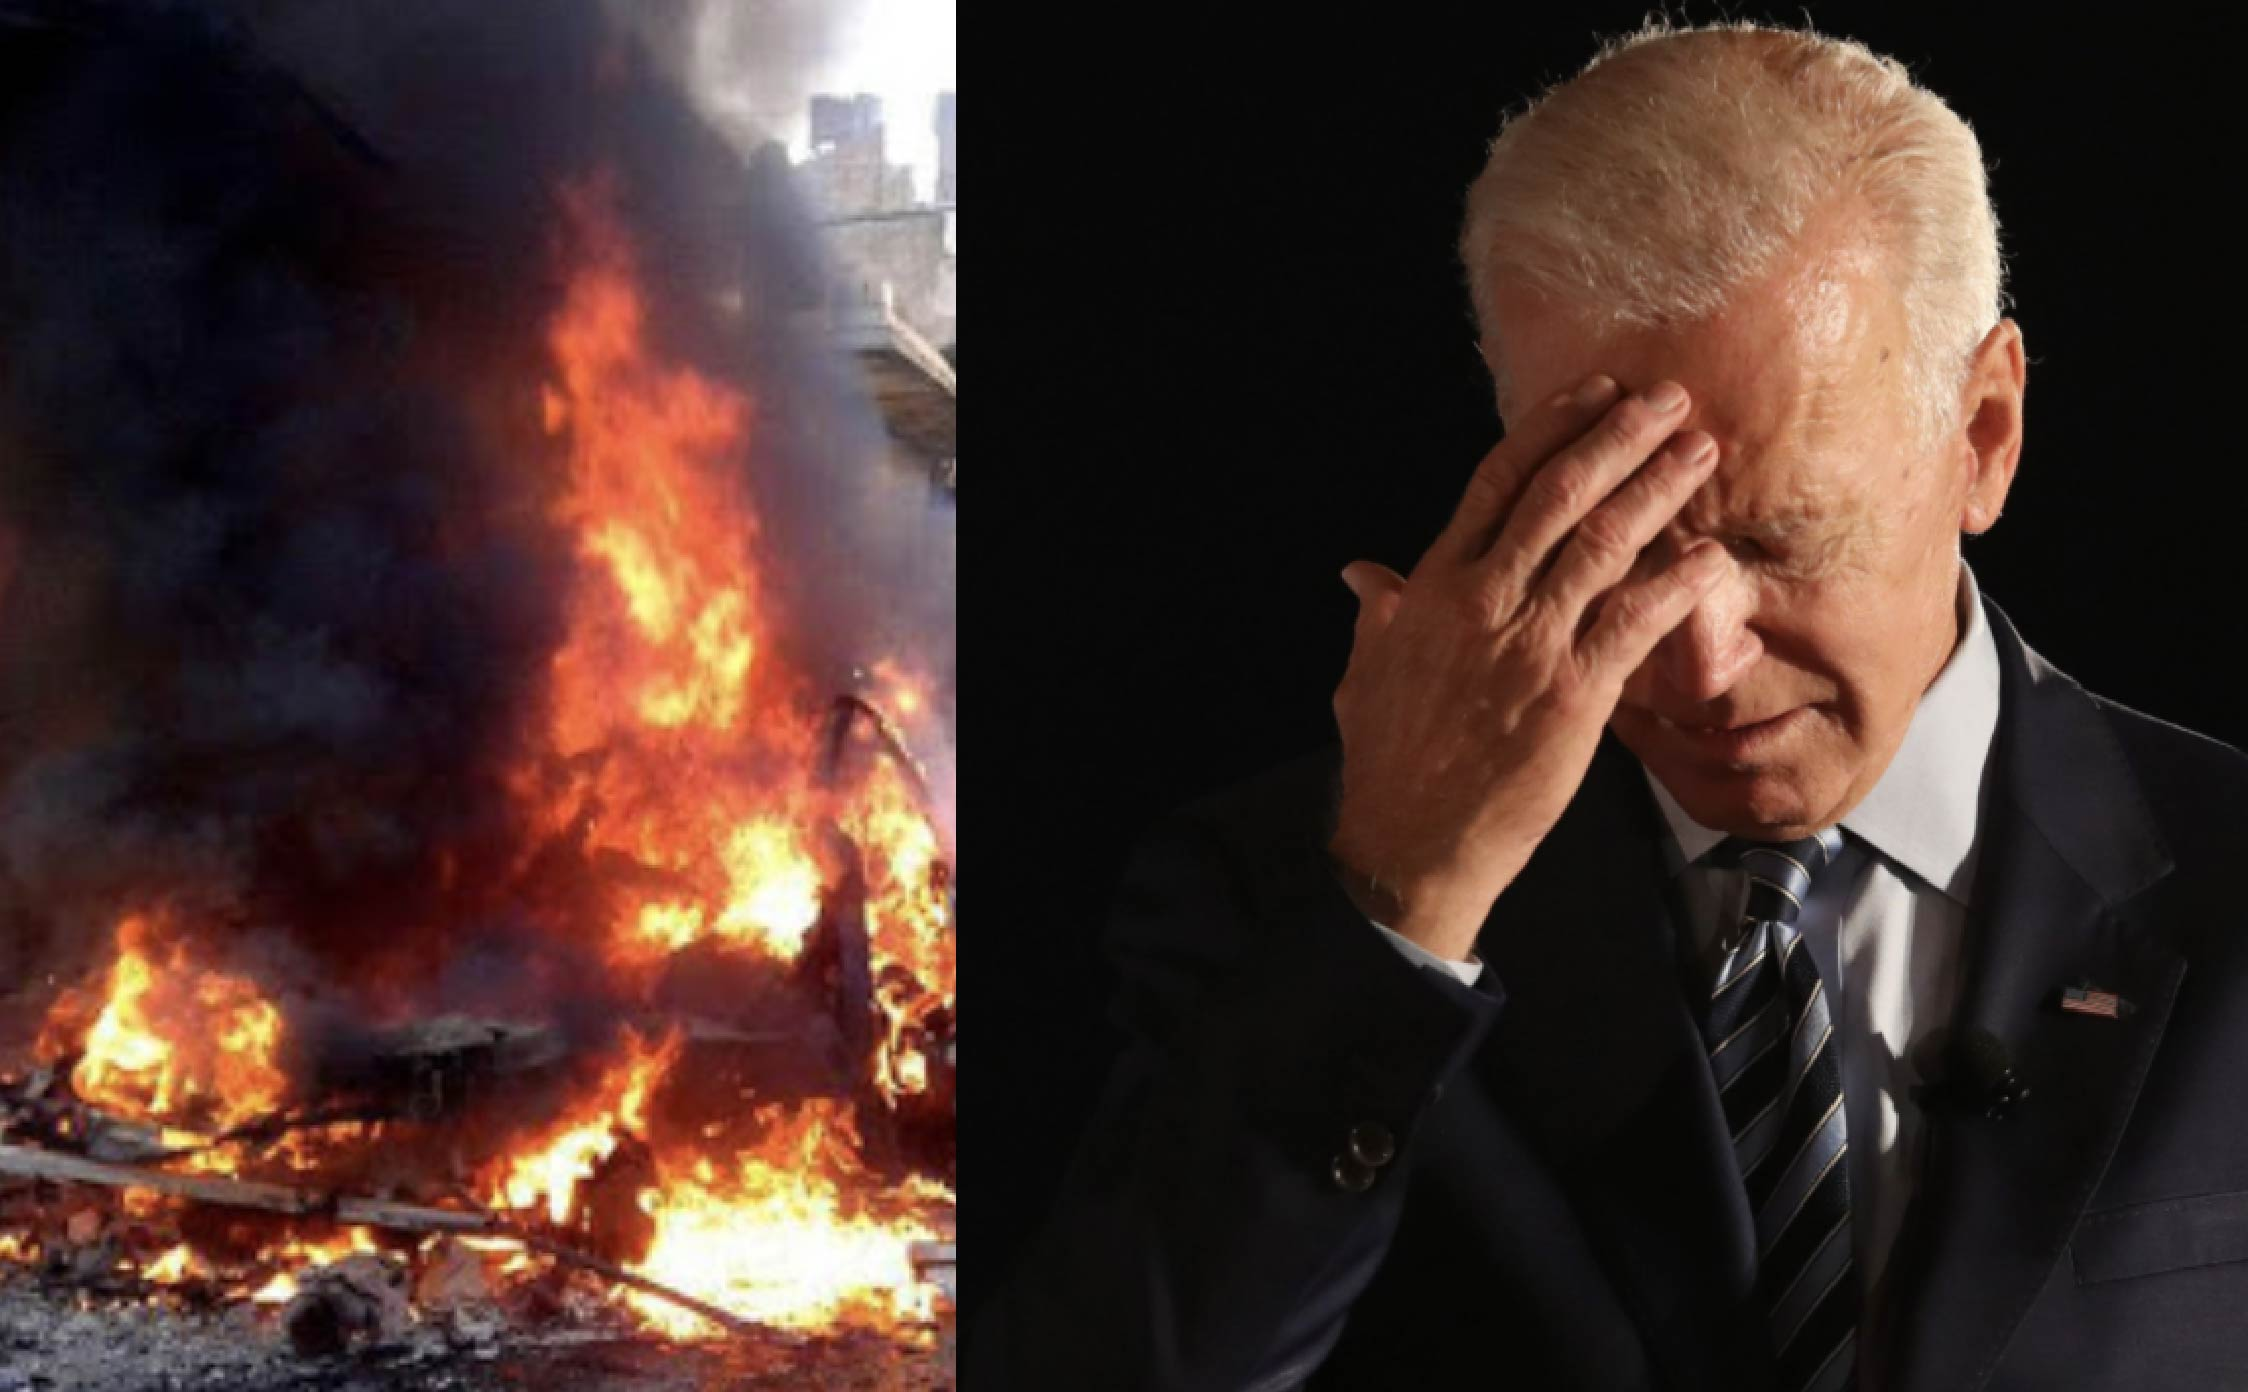 Liberals Furious Joe is Bombing Syria, But Still Hasn't Sent Out COVID Relief Checks - WayneDupree.com